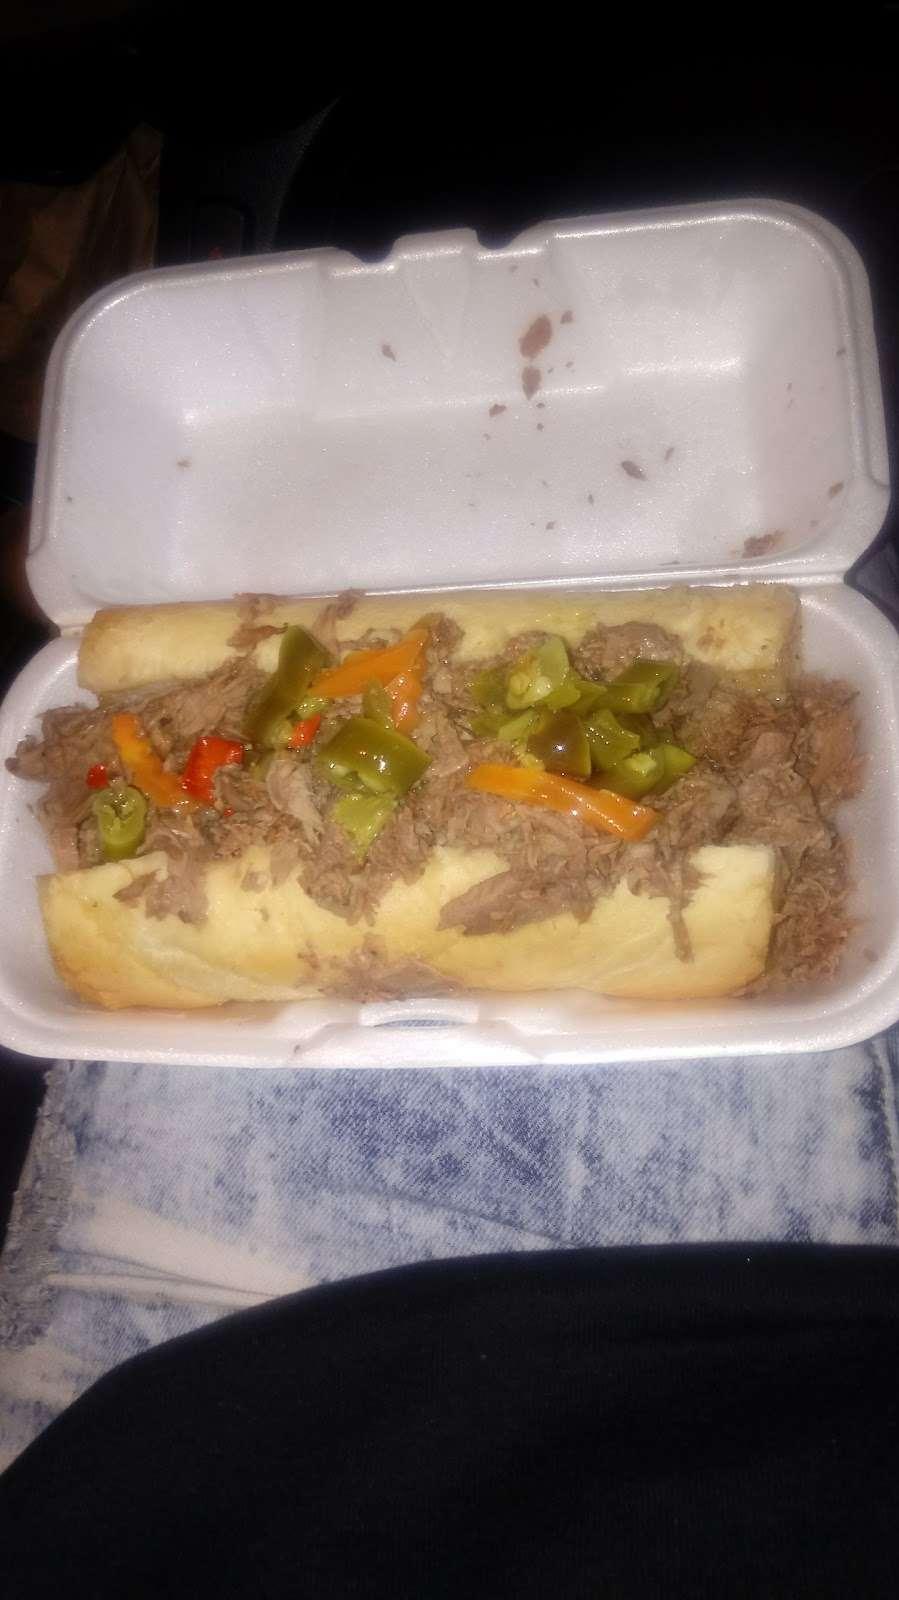 Fat Albert - restaurant    Photo 4 of 10   Address: 6854 S Ashland Ave, Chicago, IL 60636, USA   Phone: (773) 737-6161